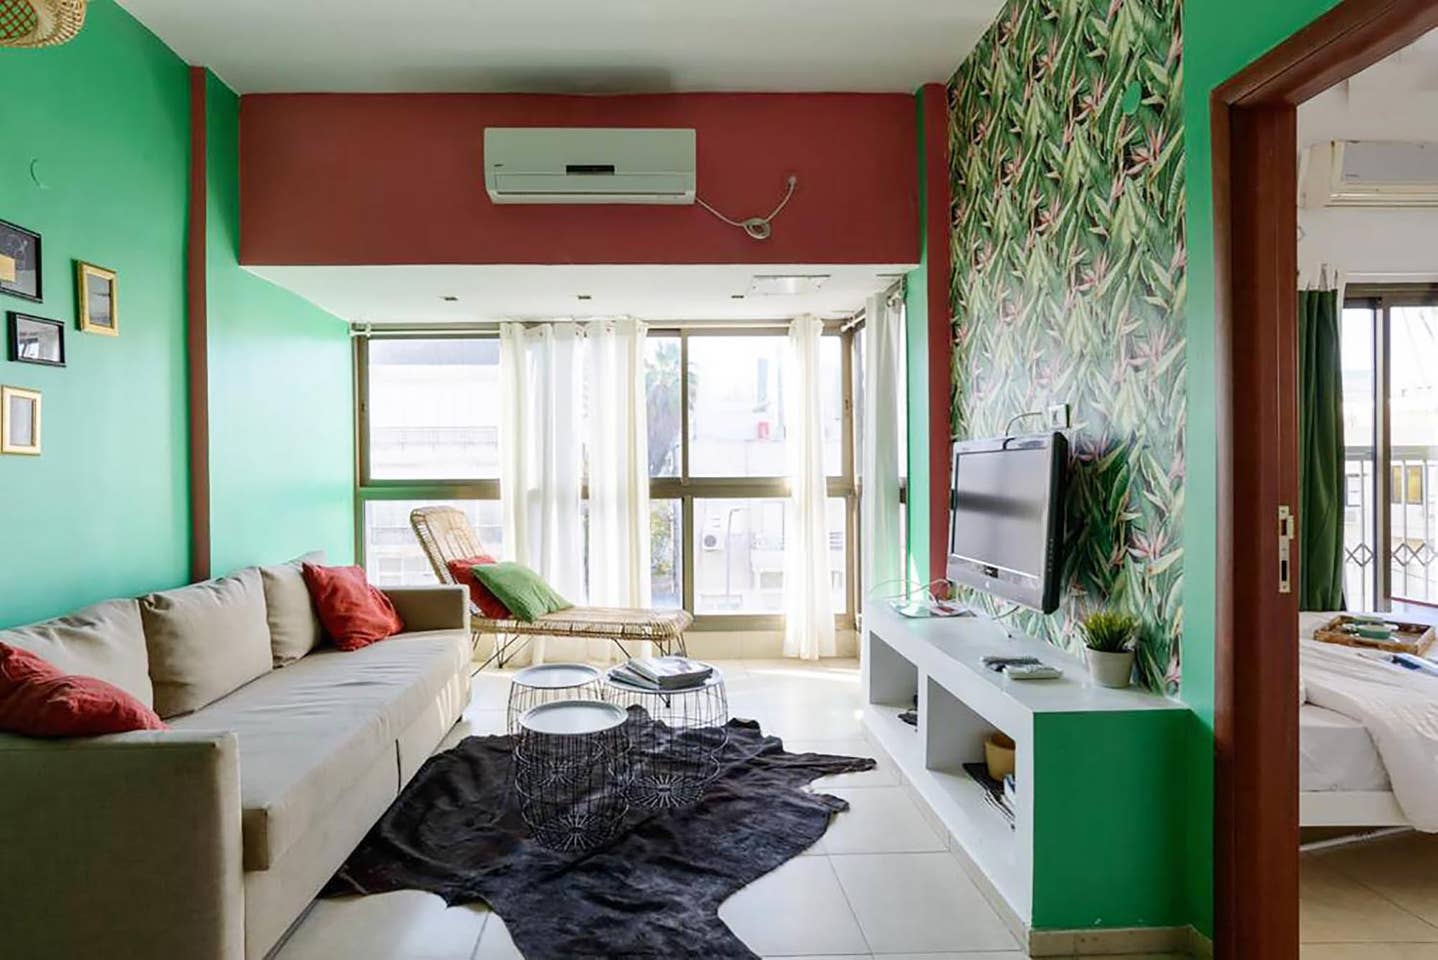 Apartment Tropical sensation next to the beach TLV photo 18483848